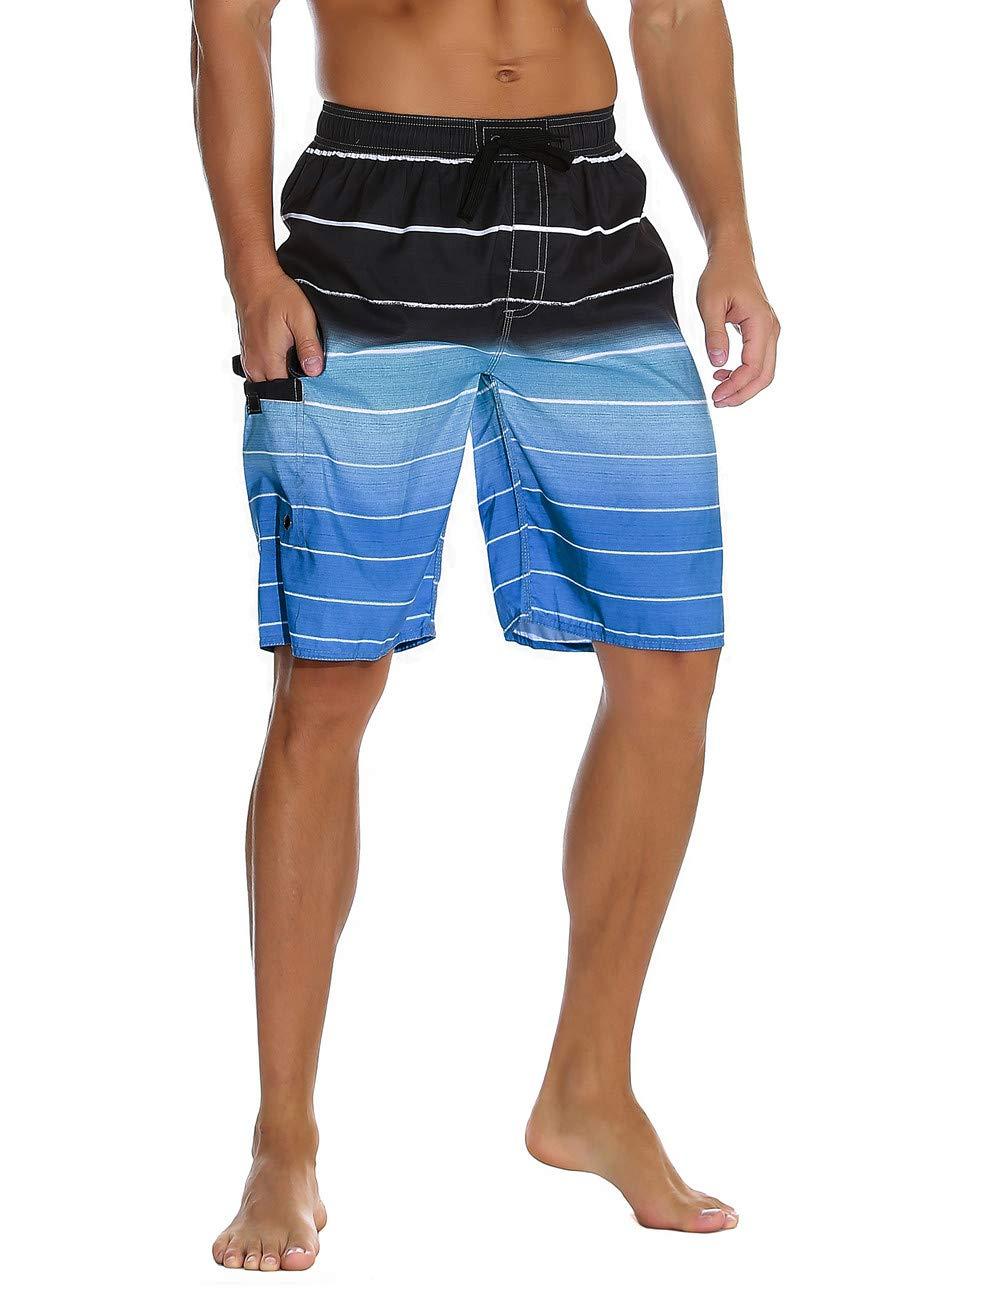 Unitop Men's Colortful Striped Swim Trunks Surfing Beach Board Shorts Lining Blue-36